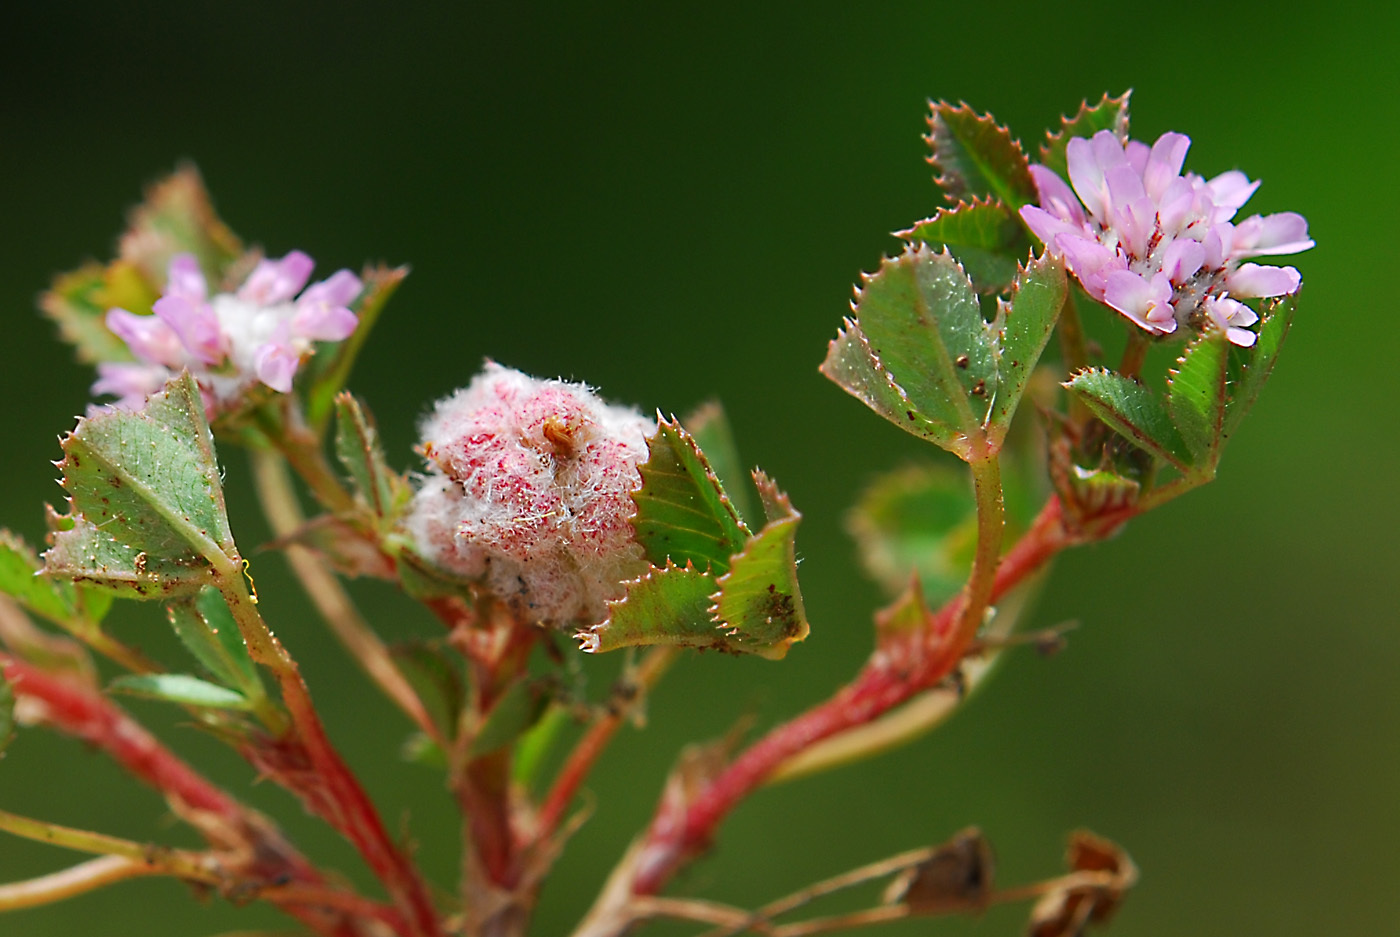 https://pictures.bgbm.org/digilib/Scaler?fn=Cyprus/Trifolium_tomentosum_B2.jpg&mo=file